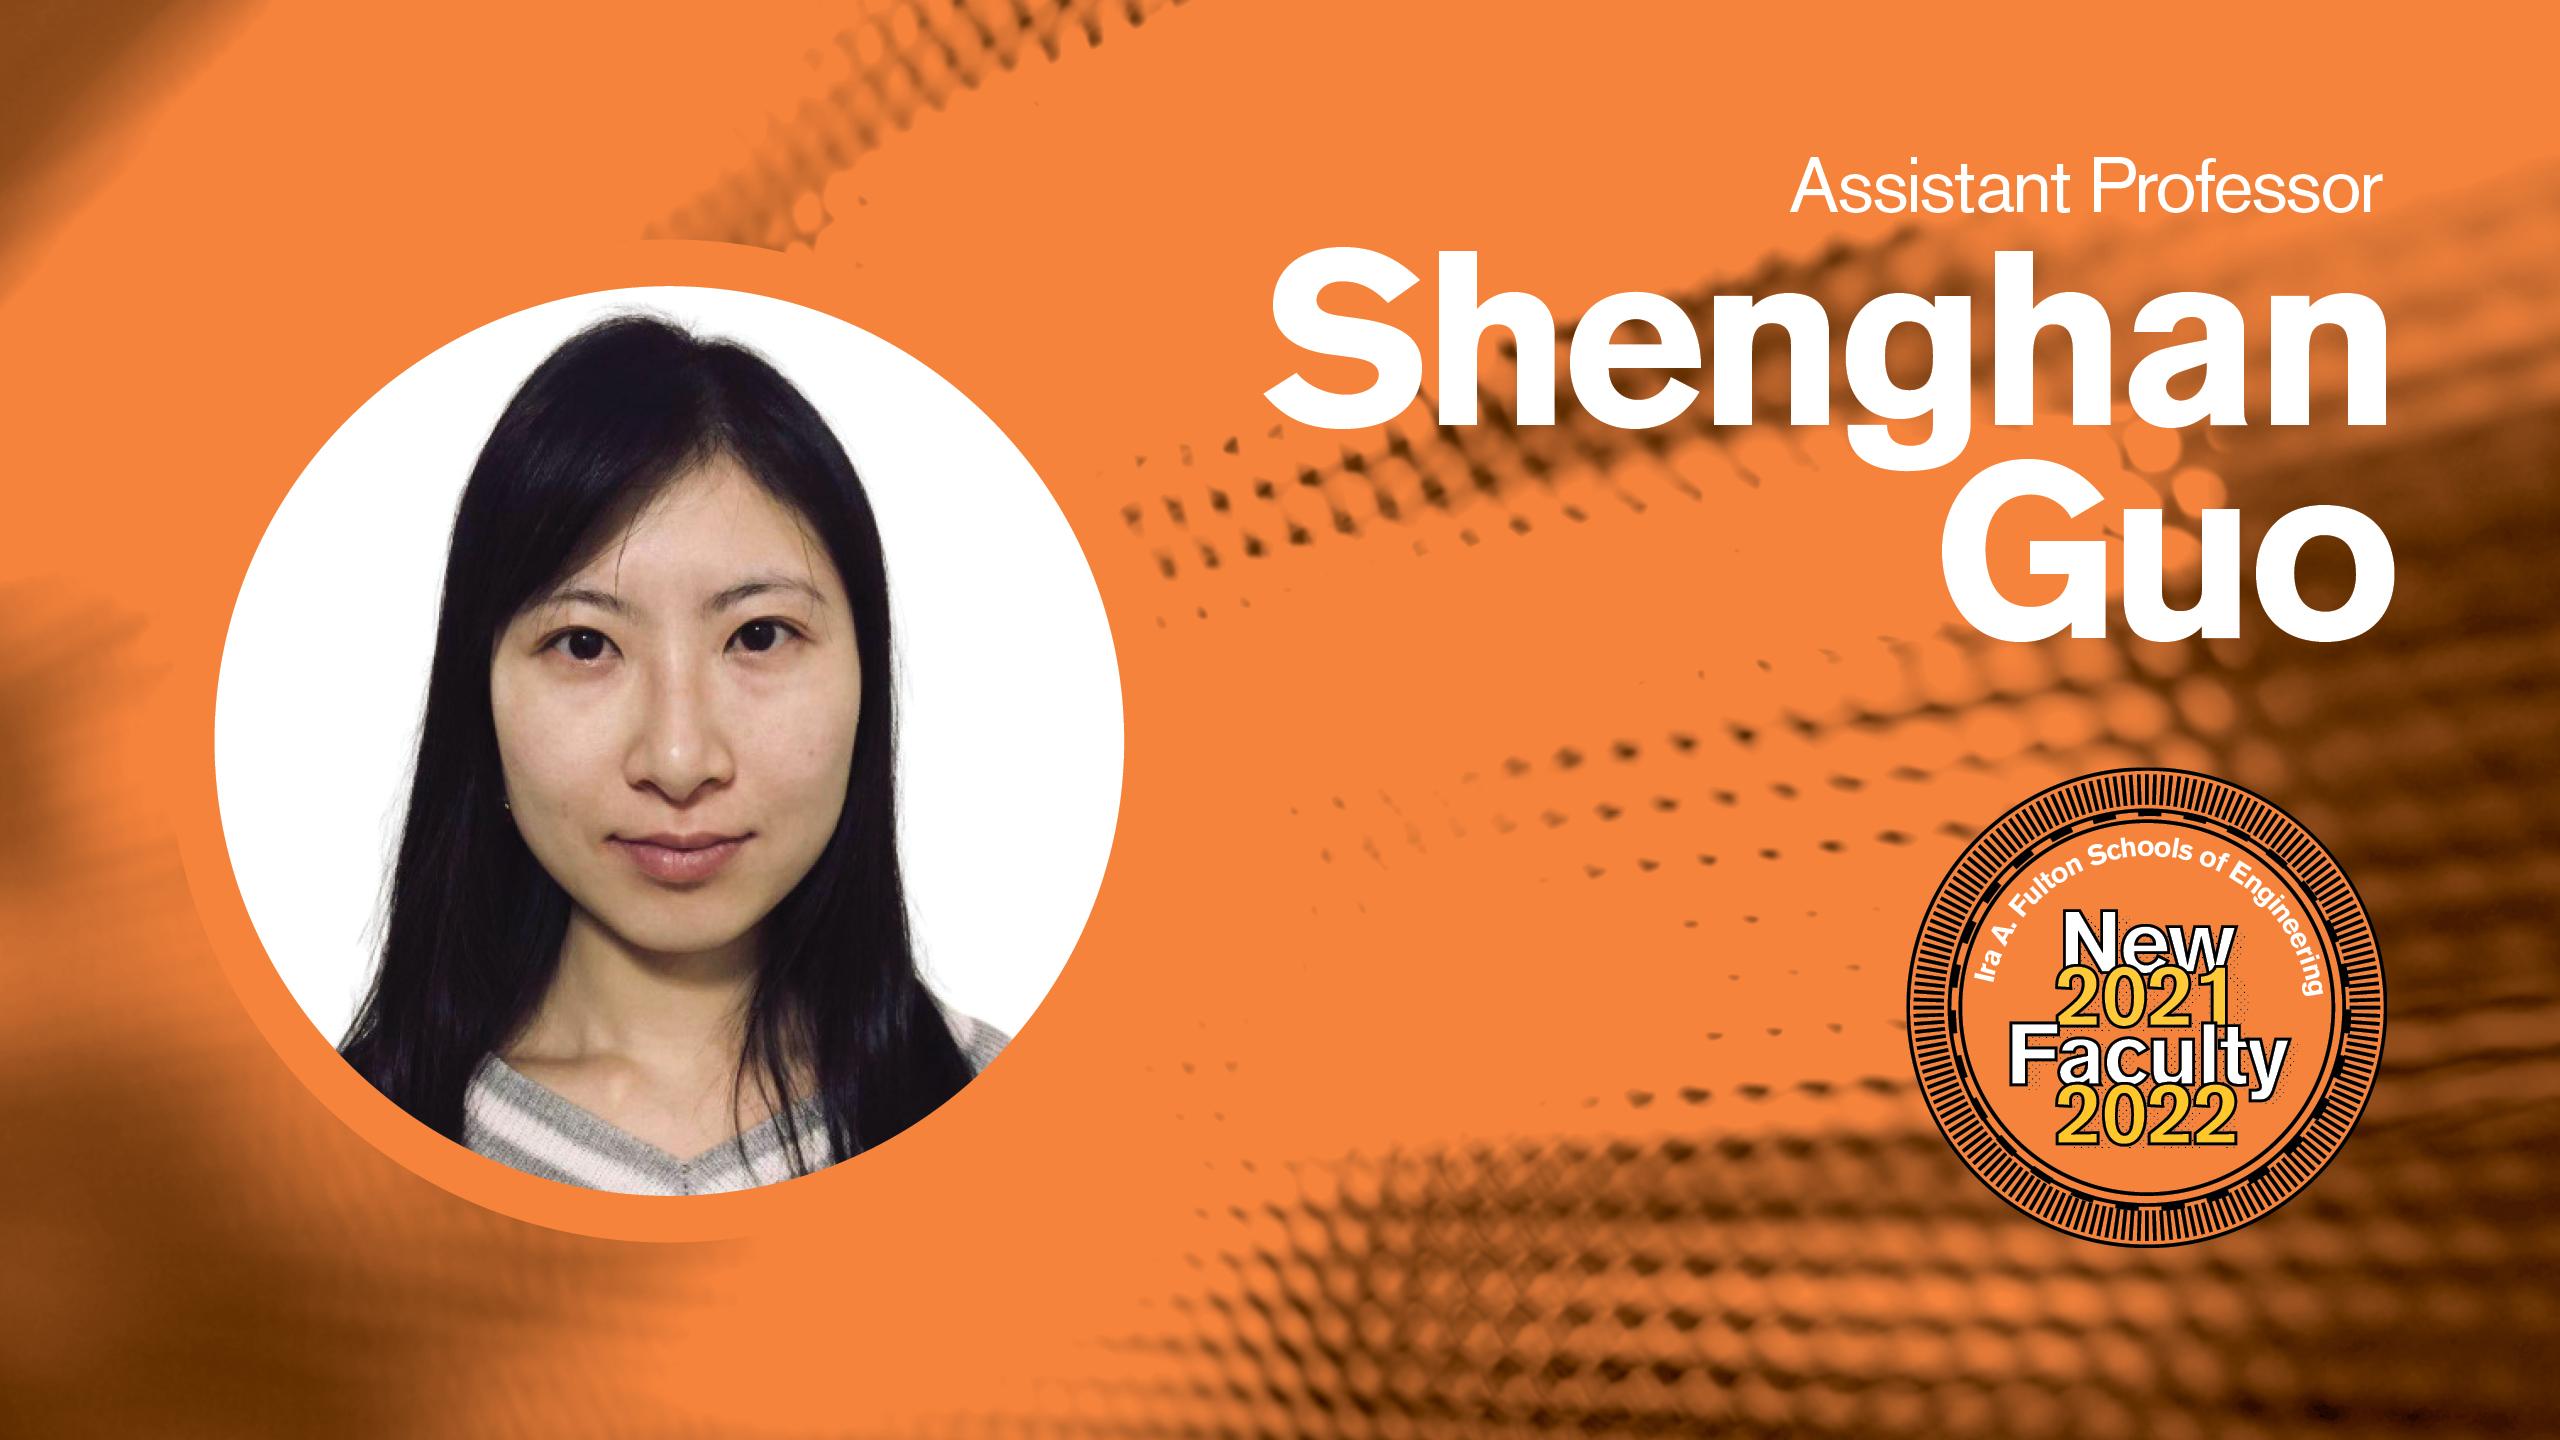 Shenghan Guo